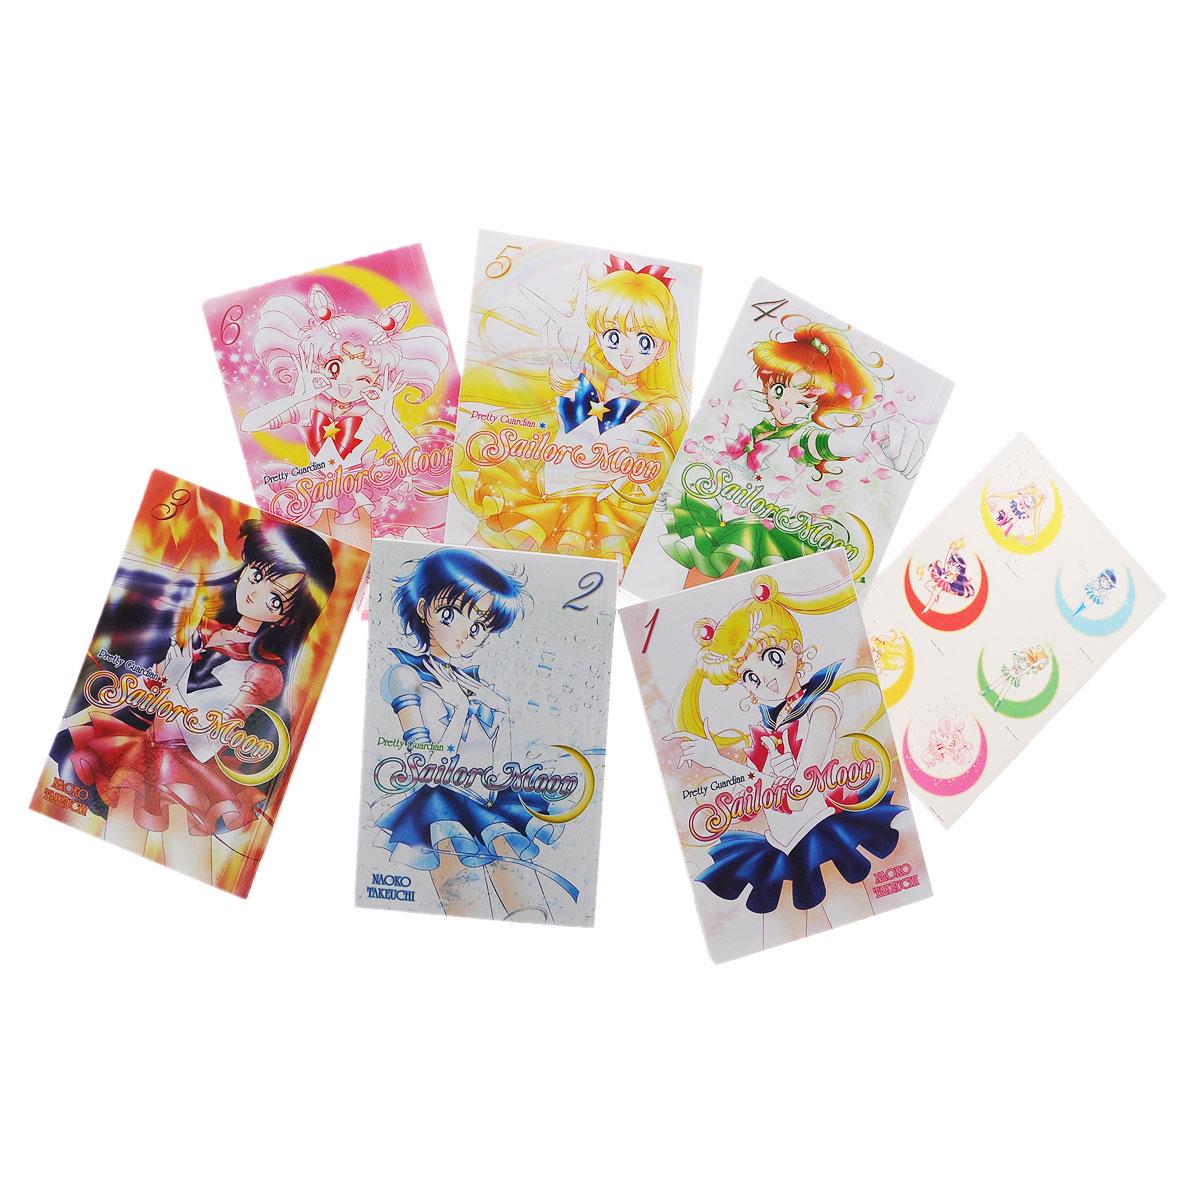 Pretty Guardian Sailor Moon: Volumes 1-6 (комплект из 6 книг)